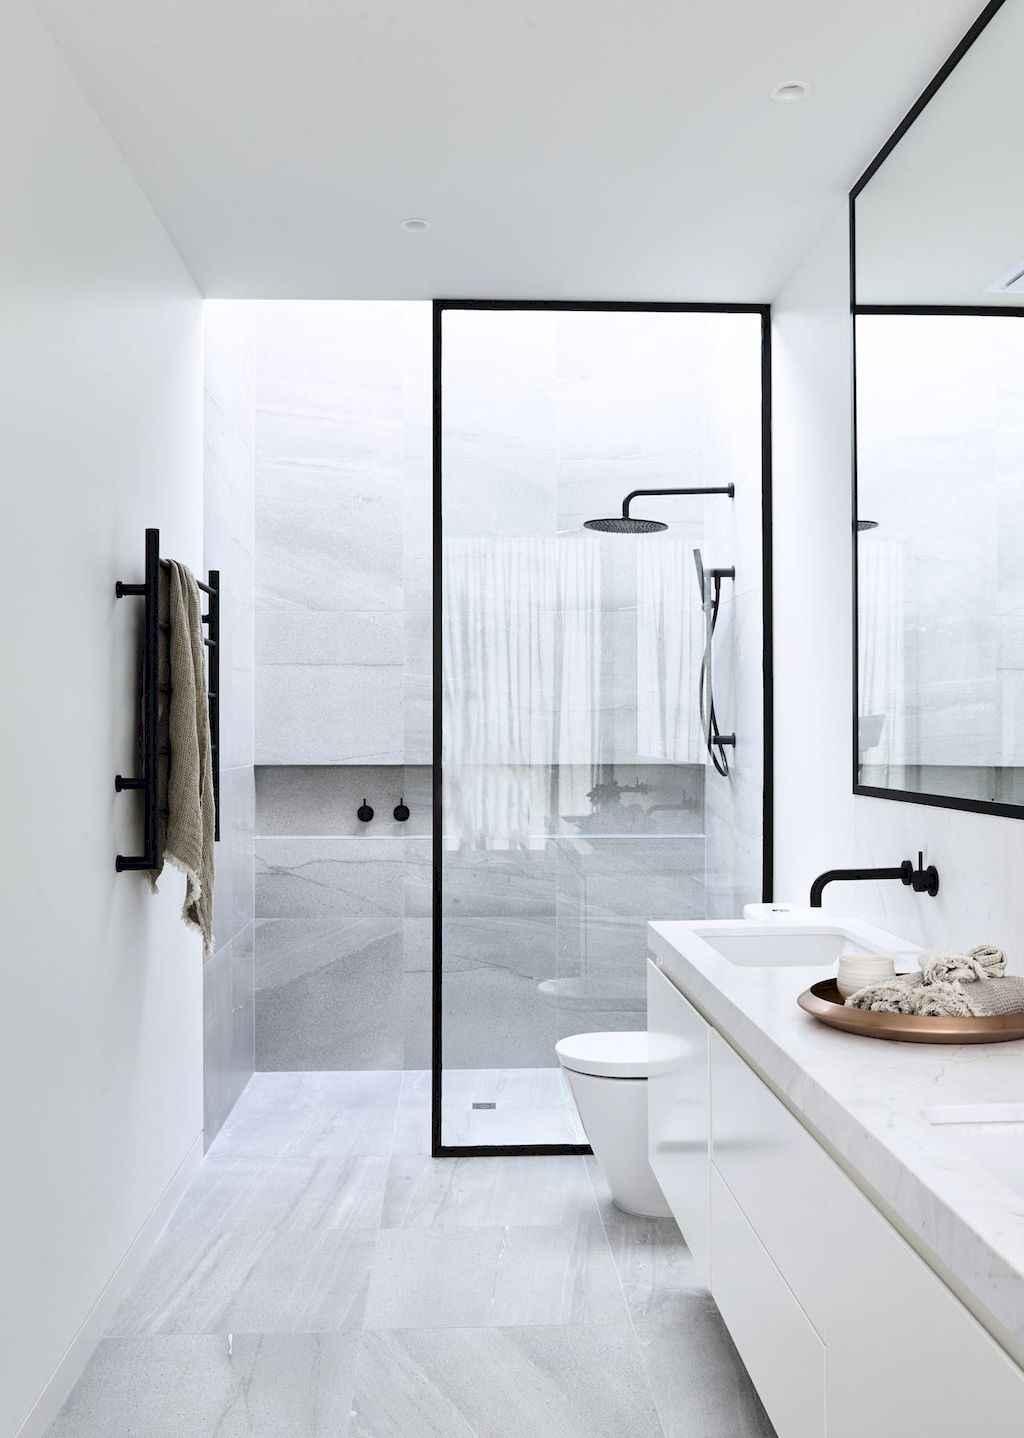 111 Brilliant Small Bathroom Remodel Ideas On A Budget (28)